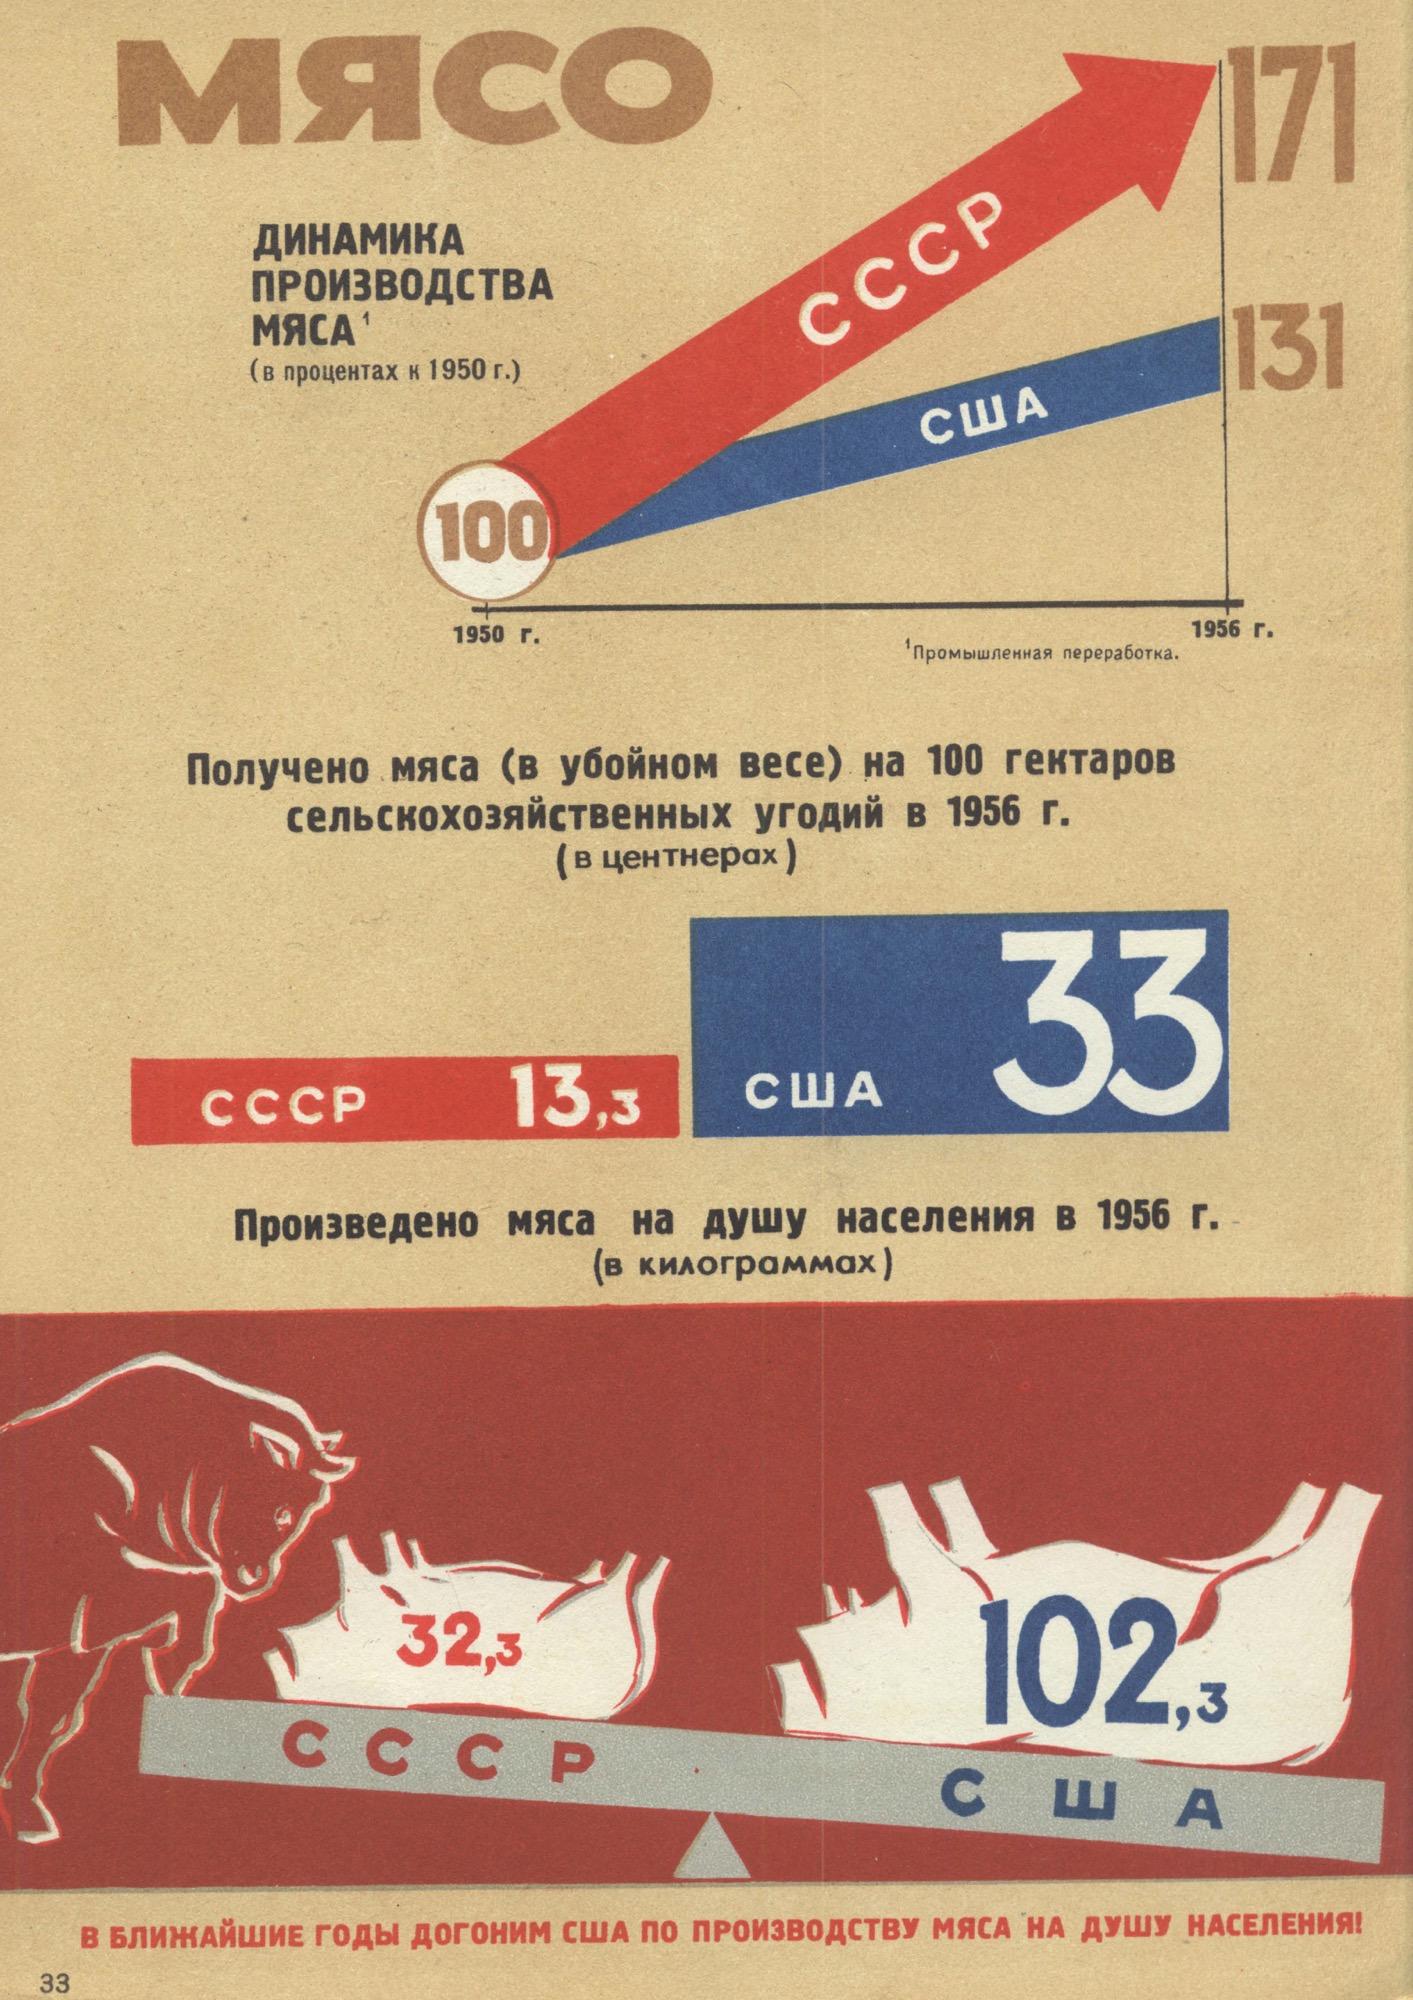 cccp infographics 33 copy